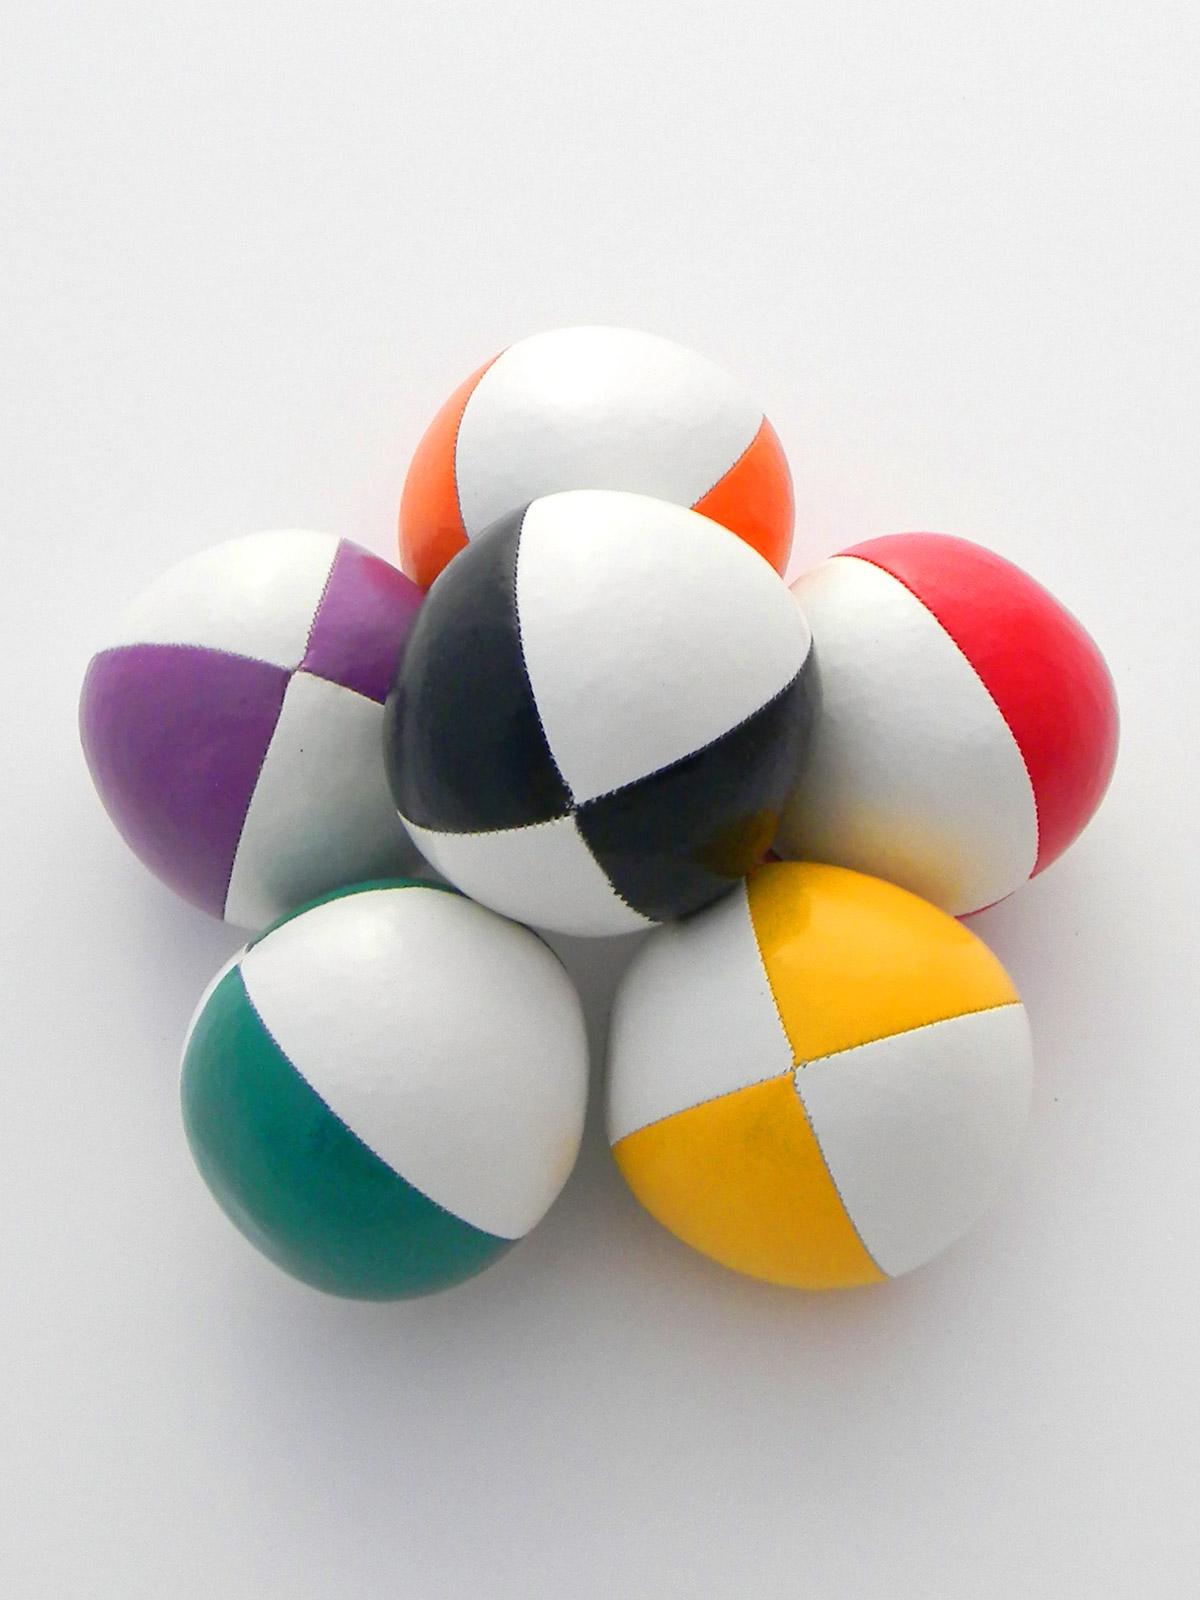 Vinyl Beanbag 4 Panel Juggling Balls - Vinyl Beanbags, A Soft Juggling Ball